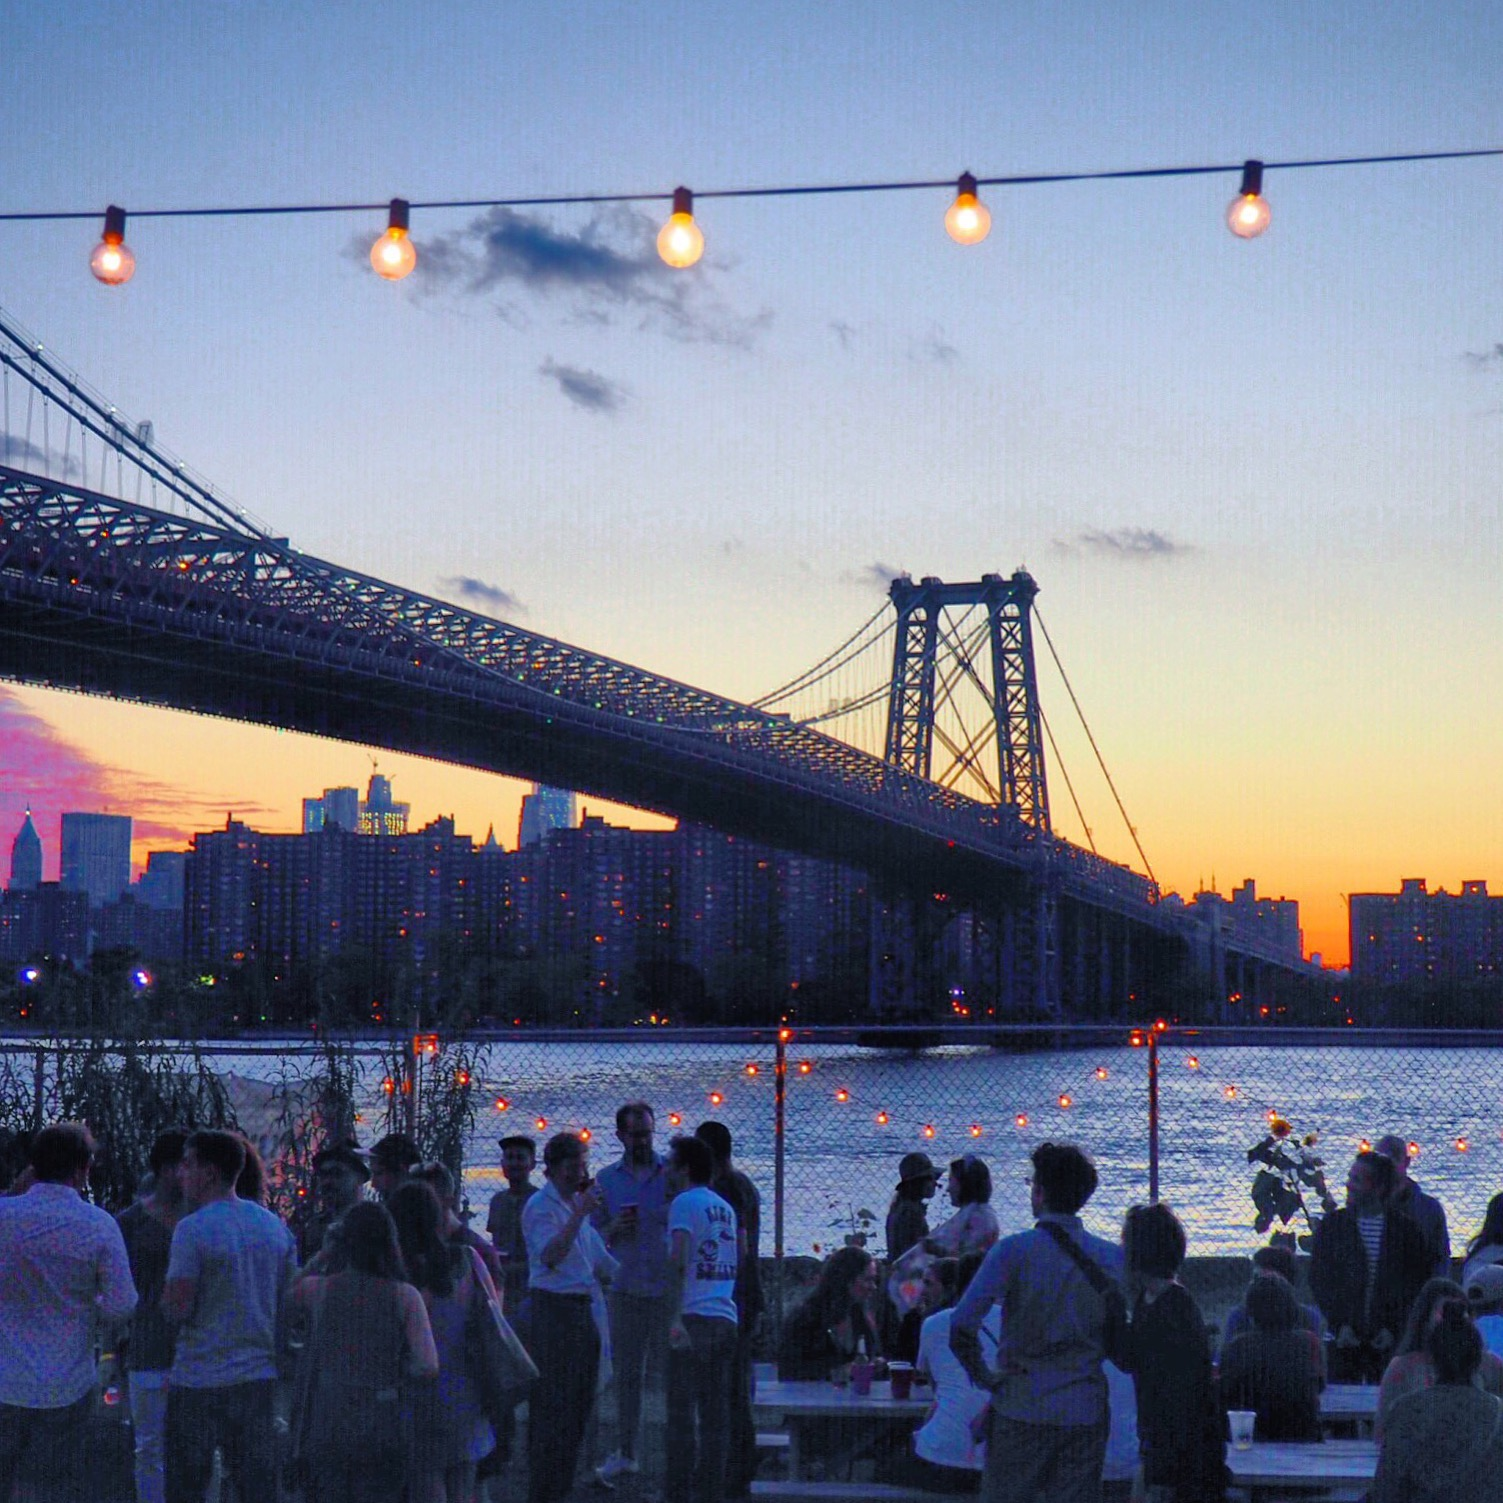 Garden party i Brooklyn ved solnedgang. Sol sommer og glade mennesker ved New York i USA